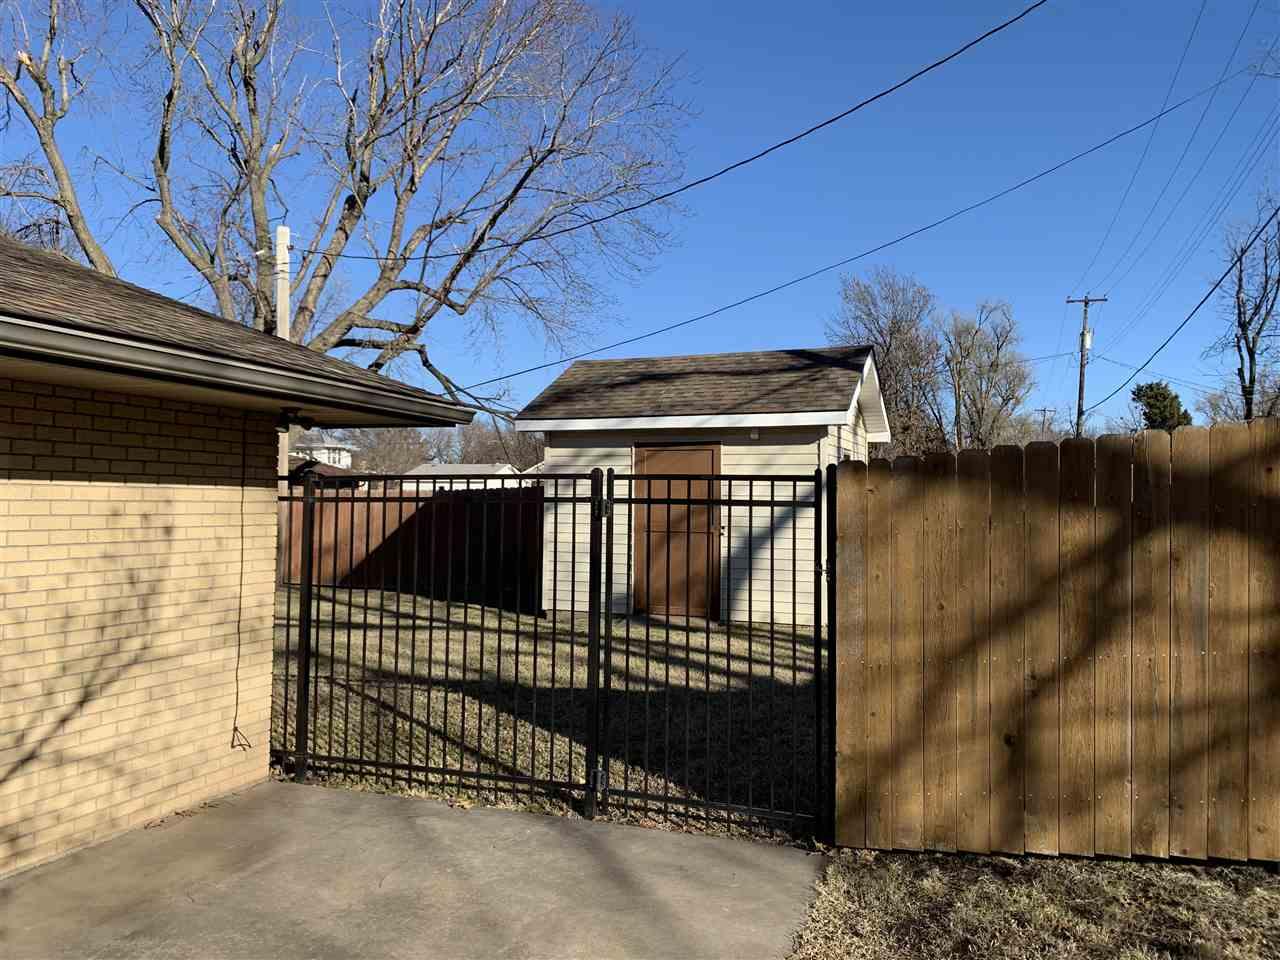 Sold Intraoffice W/MLS | 114 S Peach Newkirk, OK 74647 27